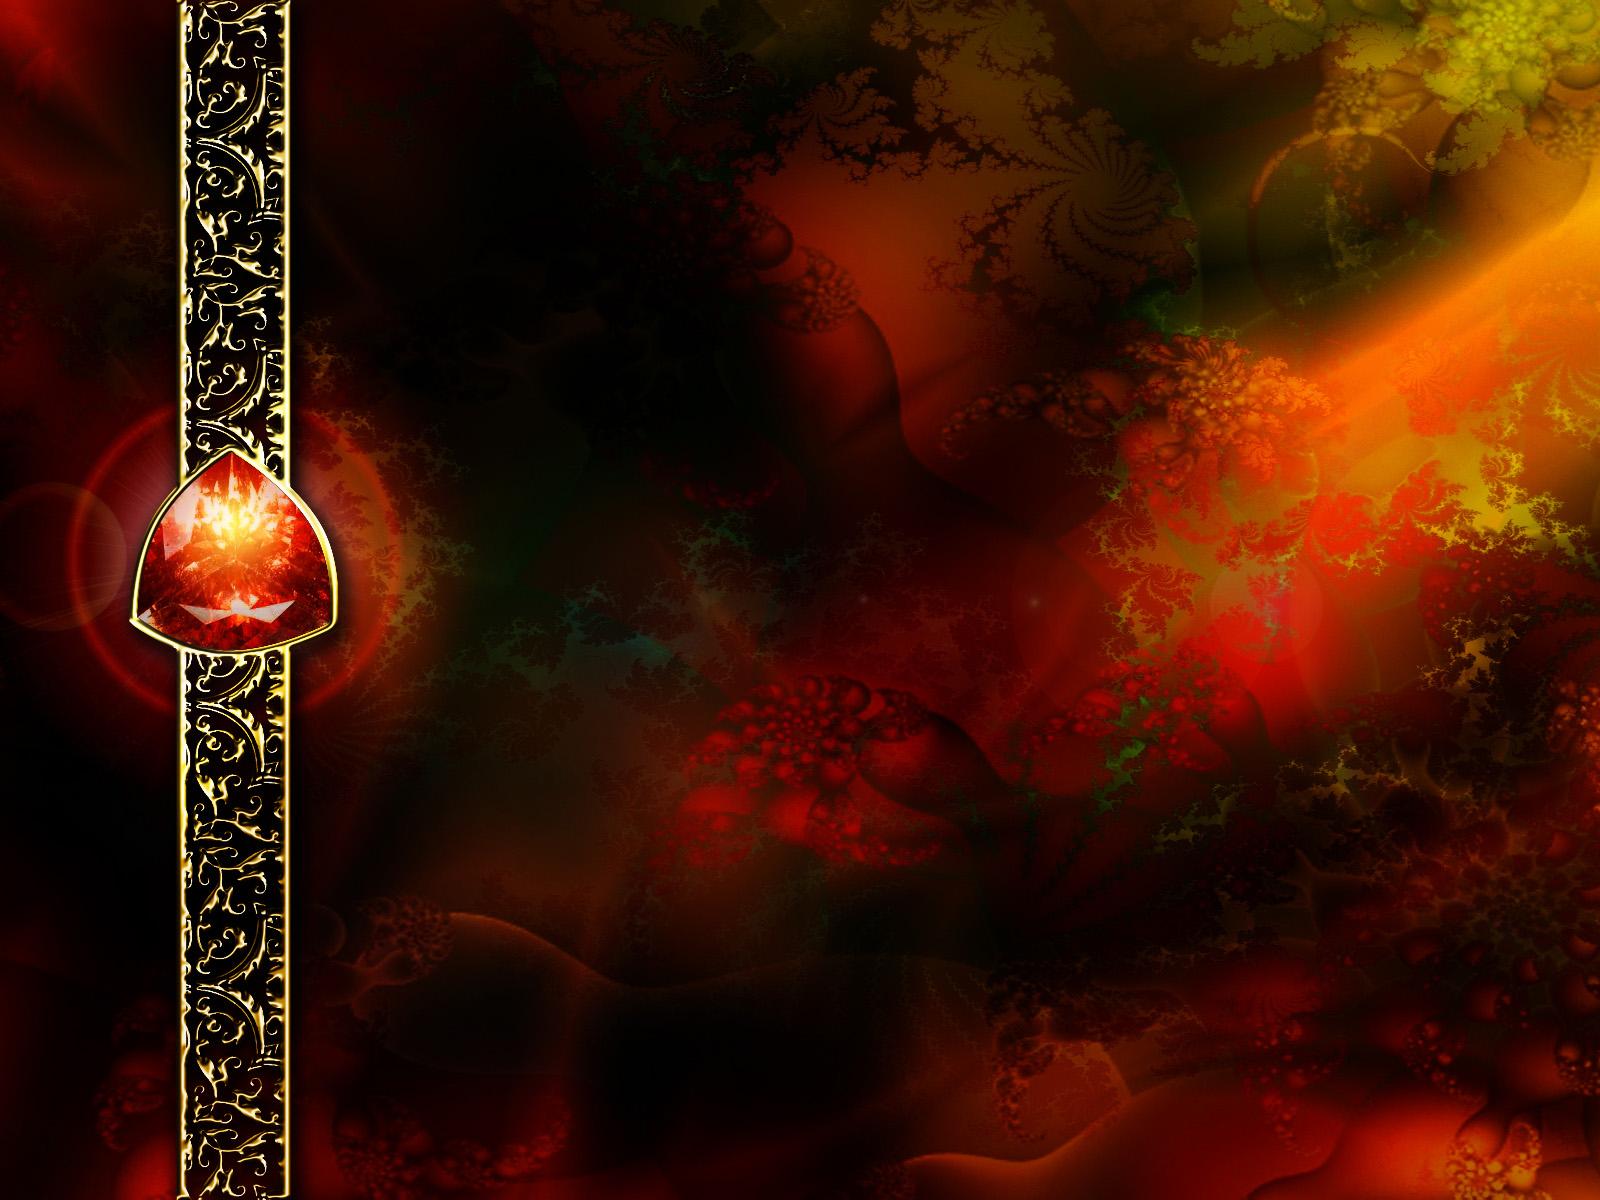 Red Abstract Fractals 462550 Wallpaper wallpaper